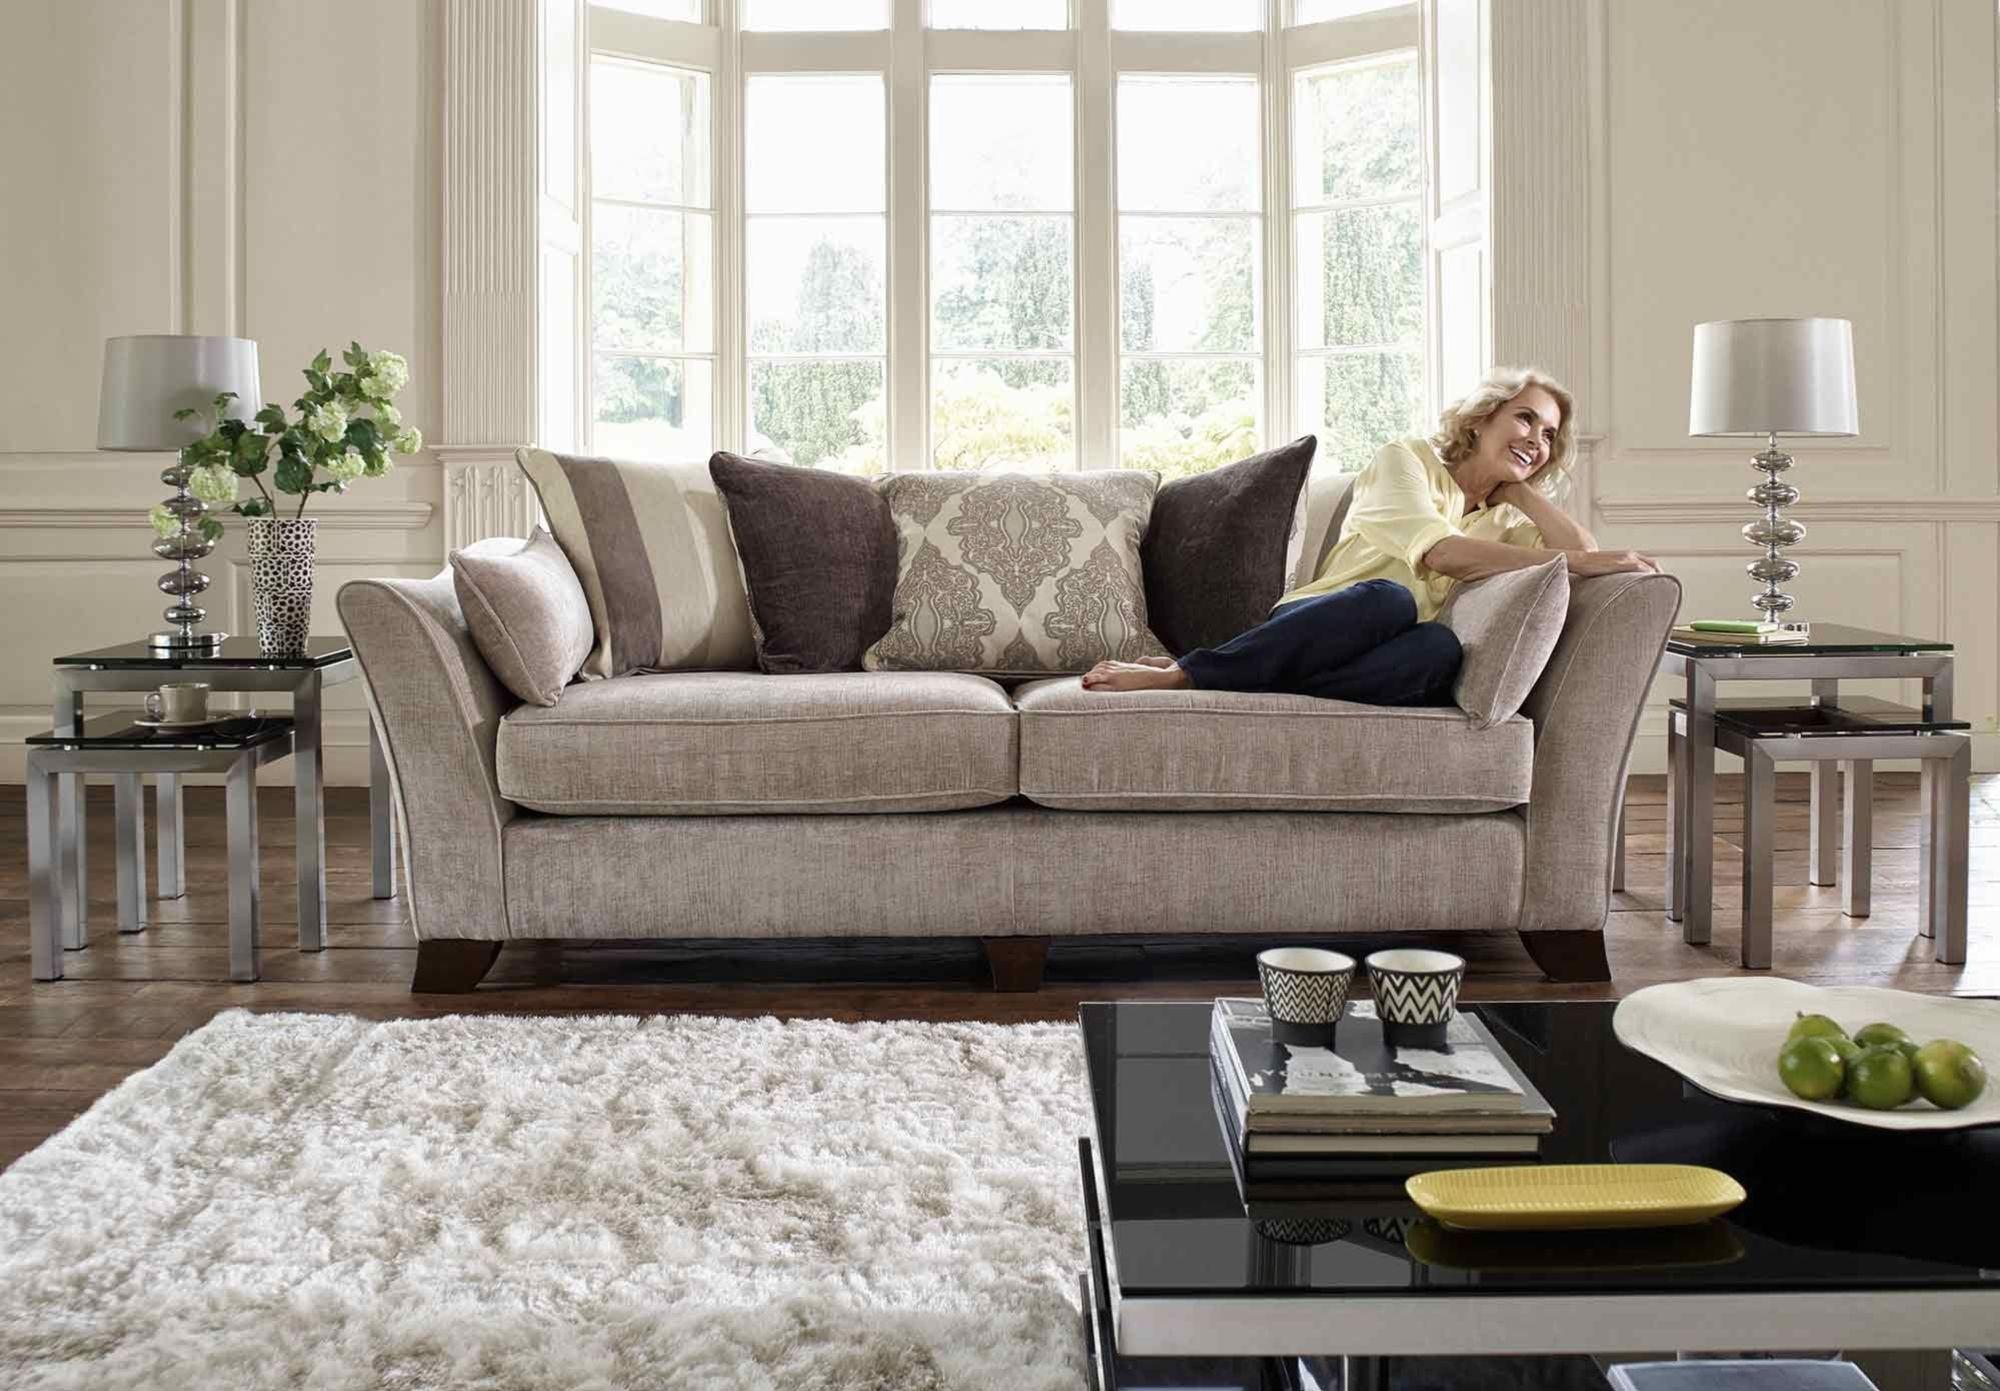 Sofa Pillows  Seater Scatter Back Sofa Annalise Upholstered Furniture at Furniture Village Living room furniture